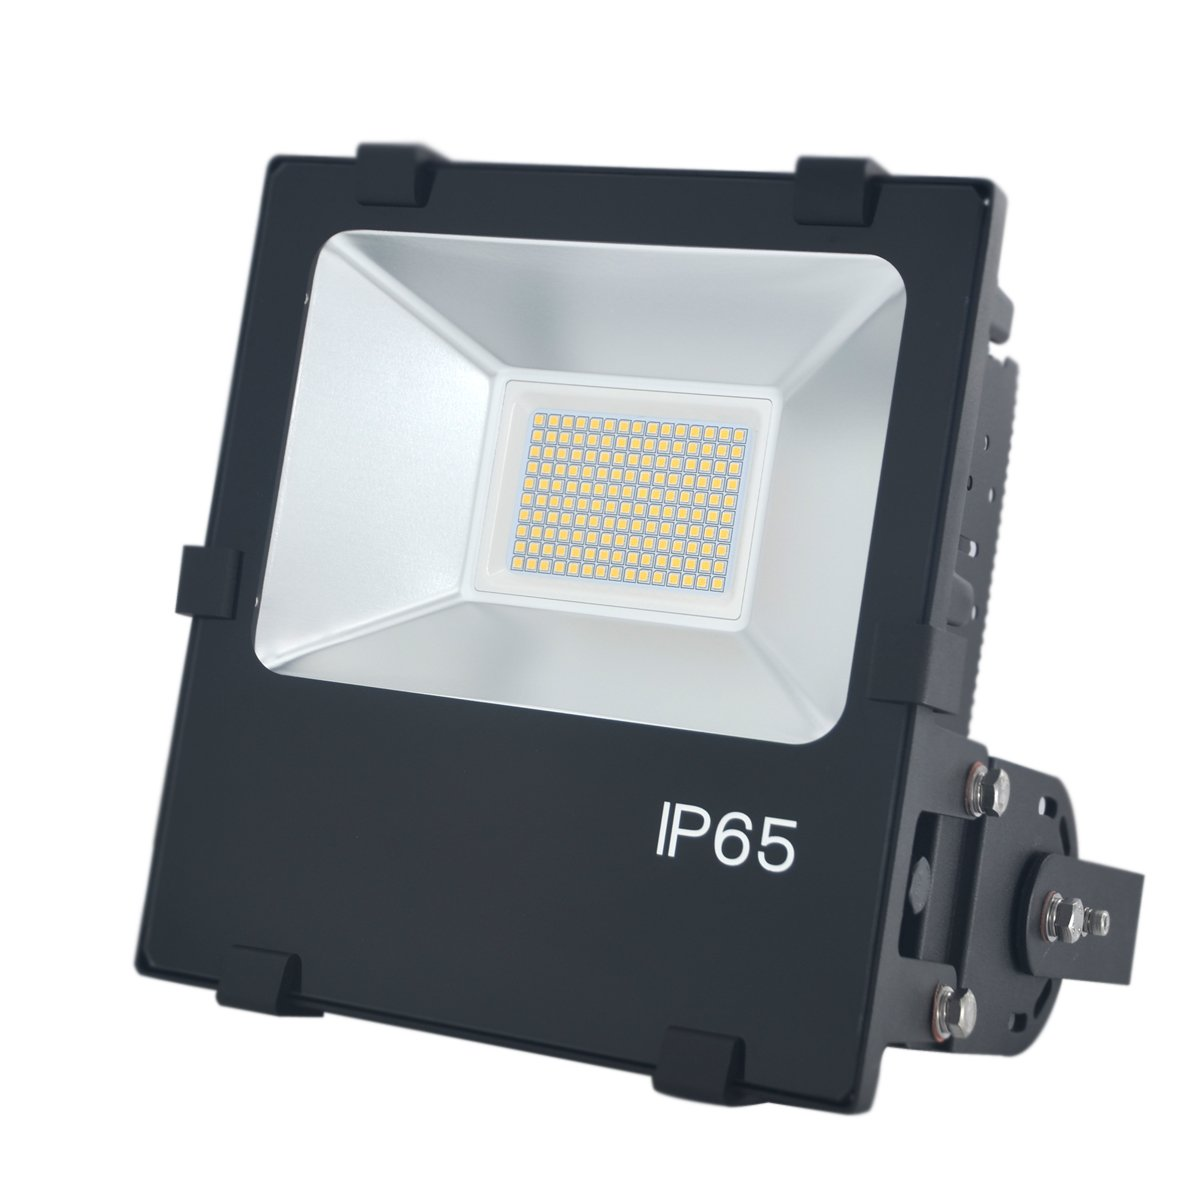 Led Flood Light Fixtures: 100W LED Flood Light Fixture- Daylight White 5000K-10000